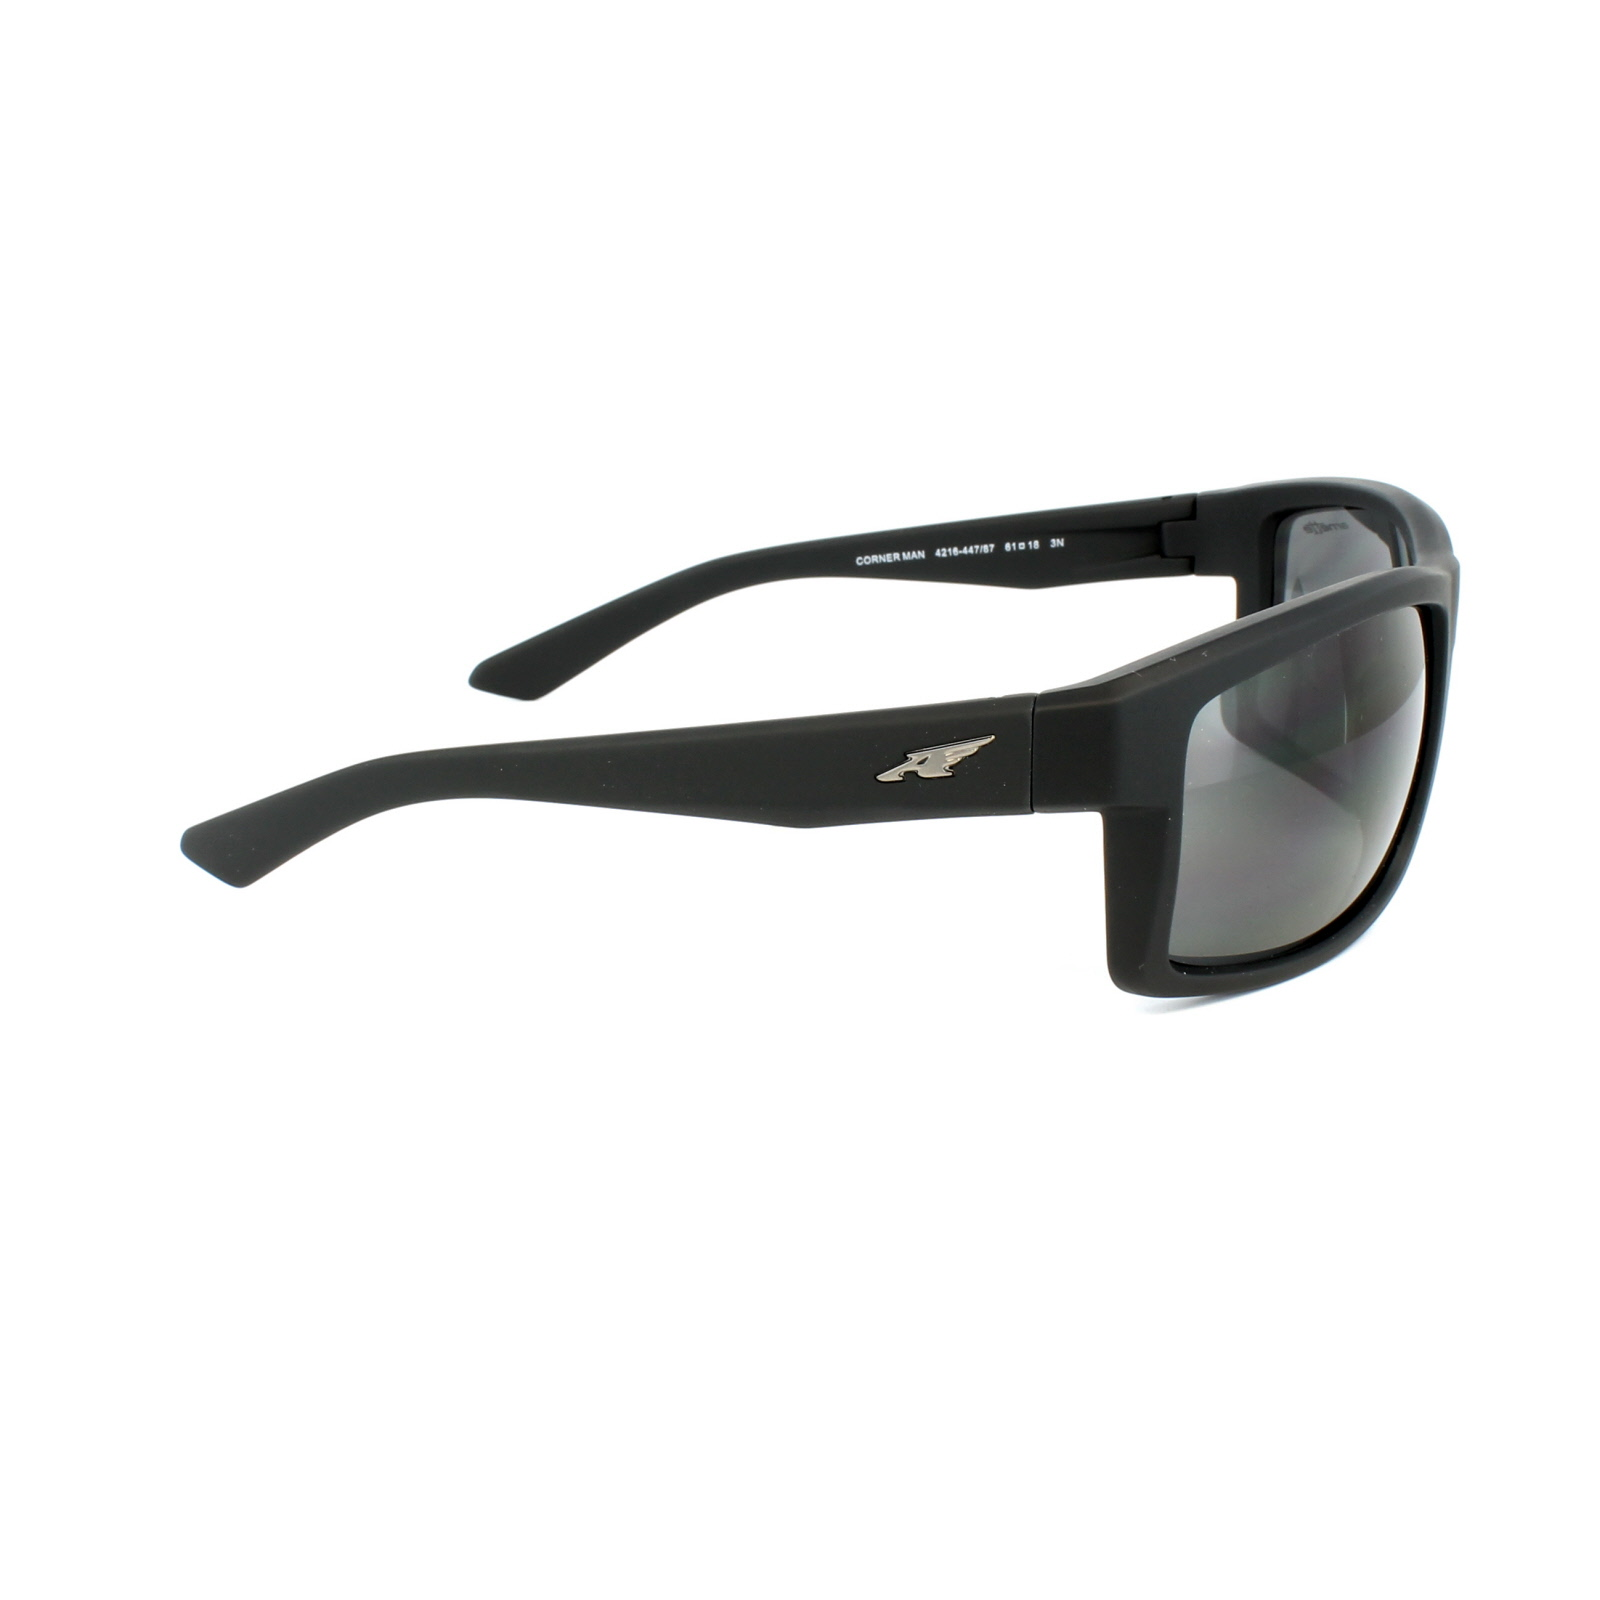 29fbdb43e4 Sentinel Arnette Sunglasses 4216 Corner Man 447 87 Black Dark Grey